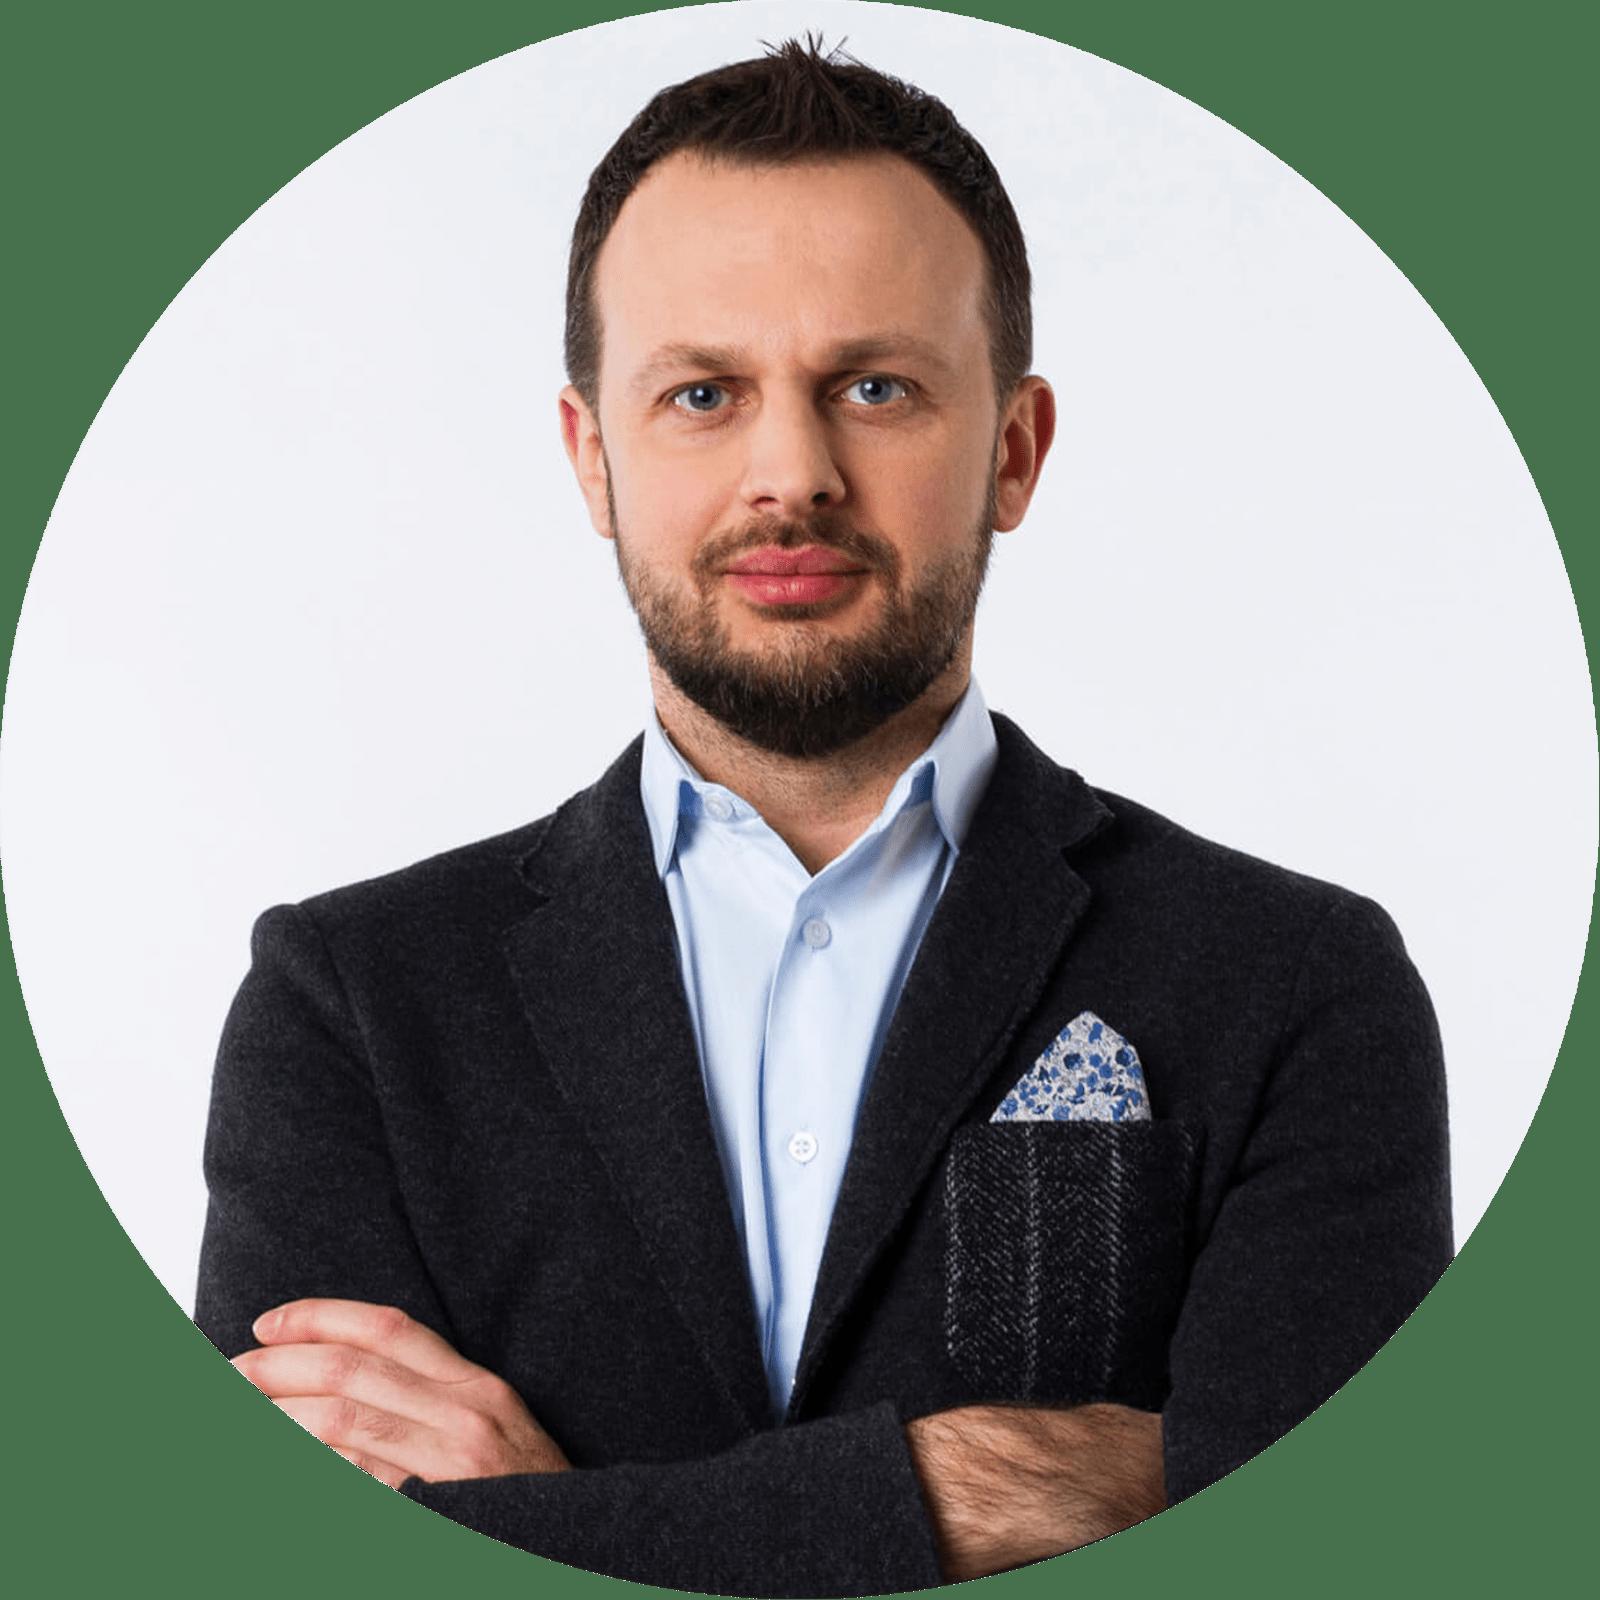 Jacek Aleksandrowicz